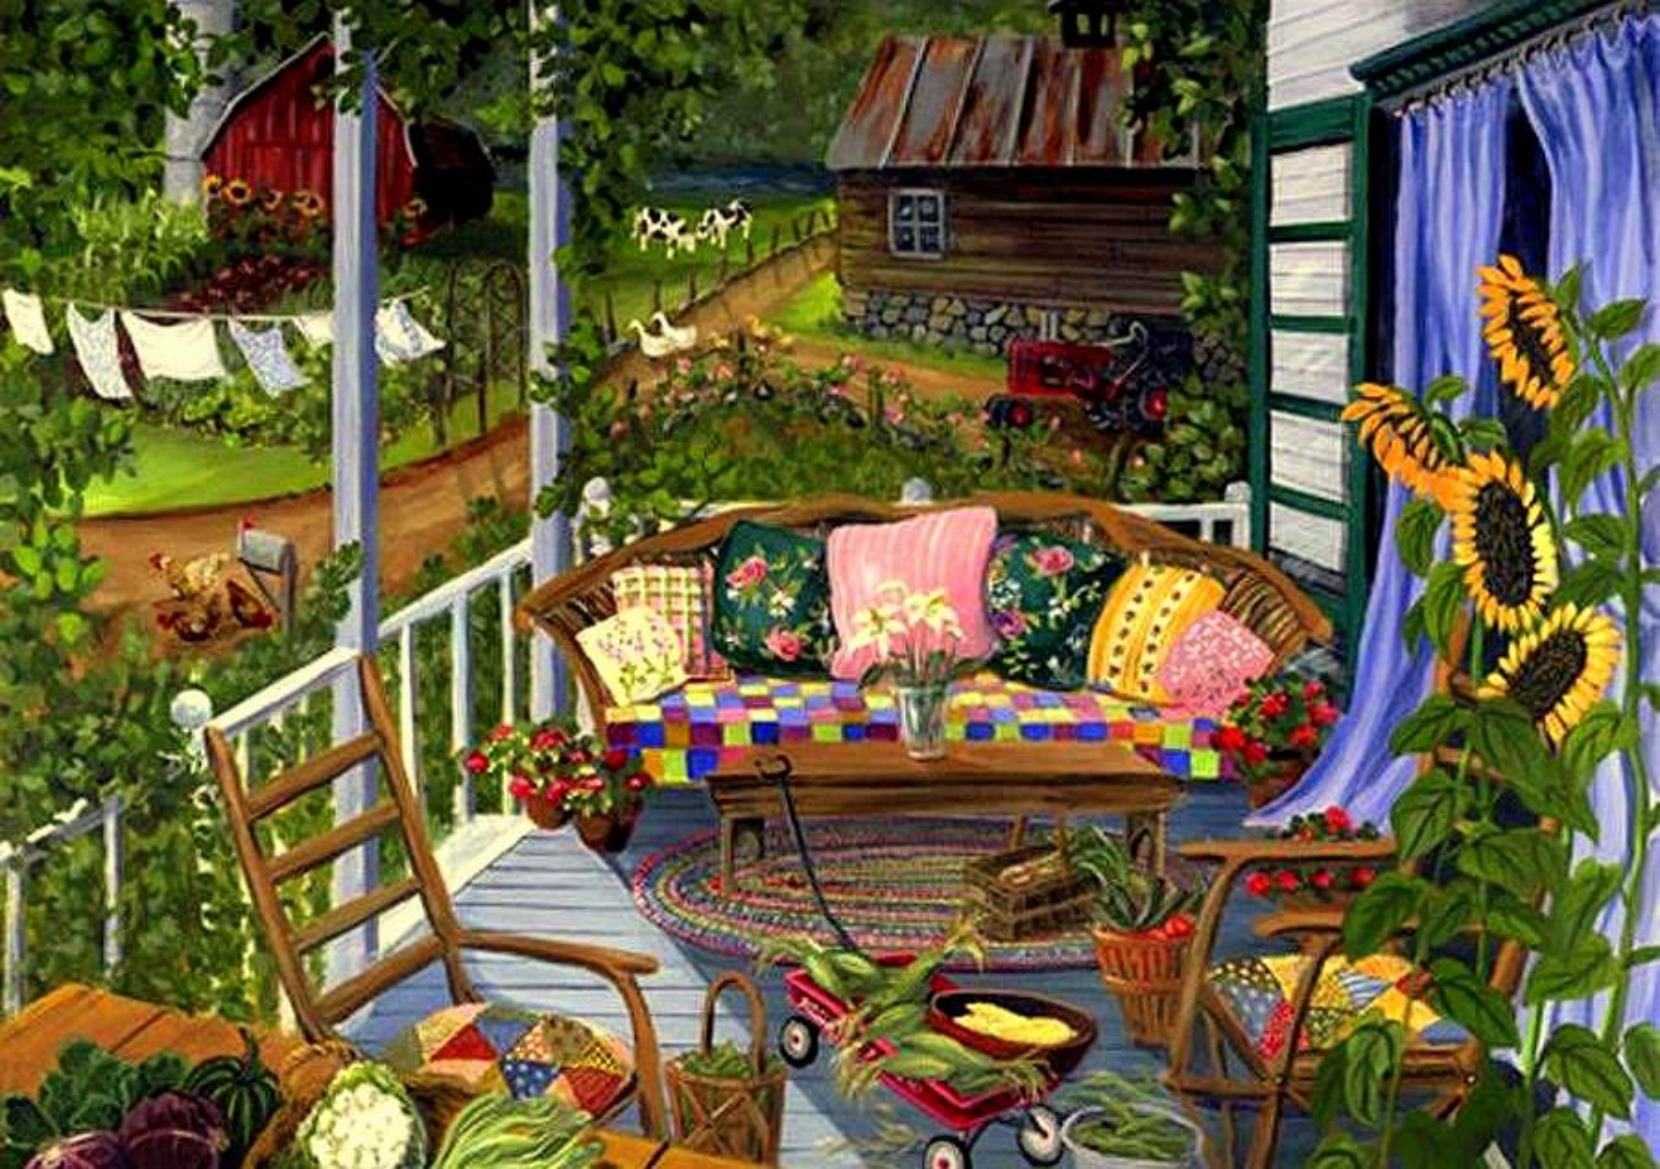 Country gardens wallpaper - Country Harvest Wallpaper Forwallpaper Com